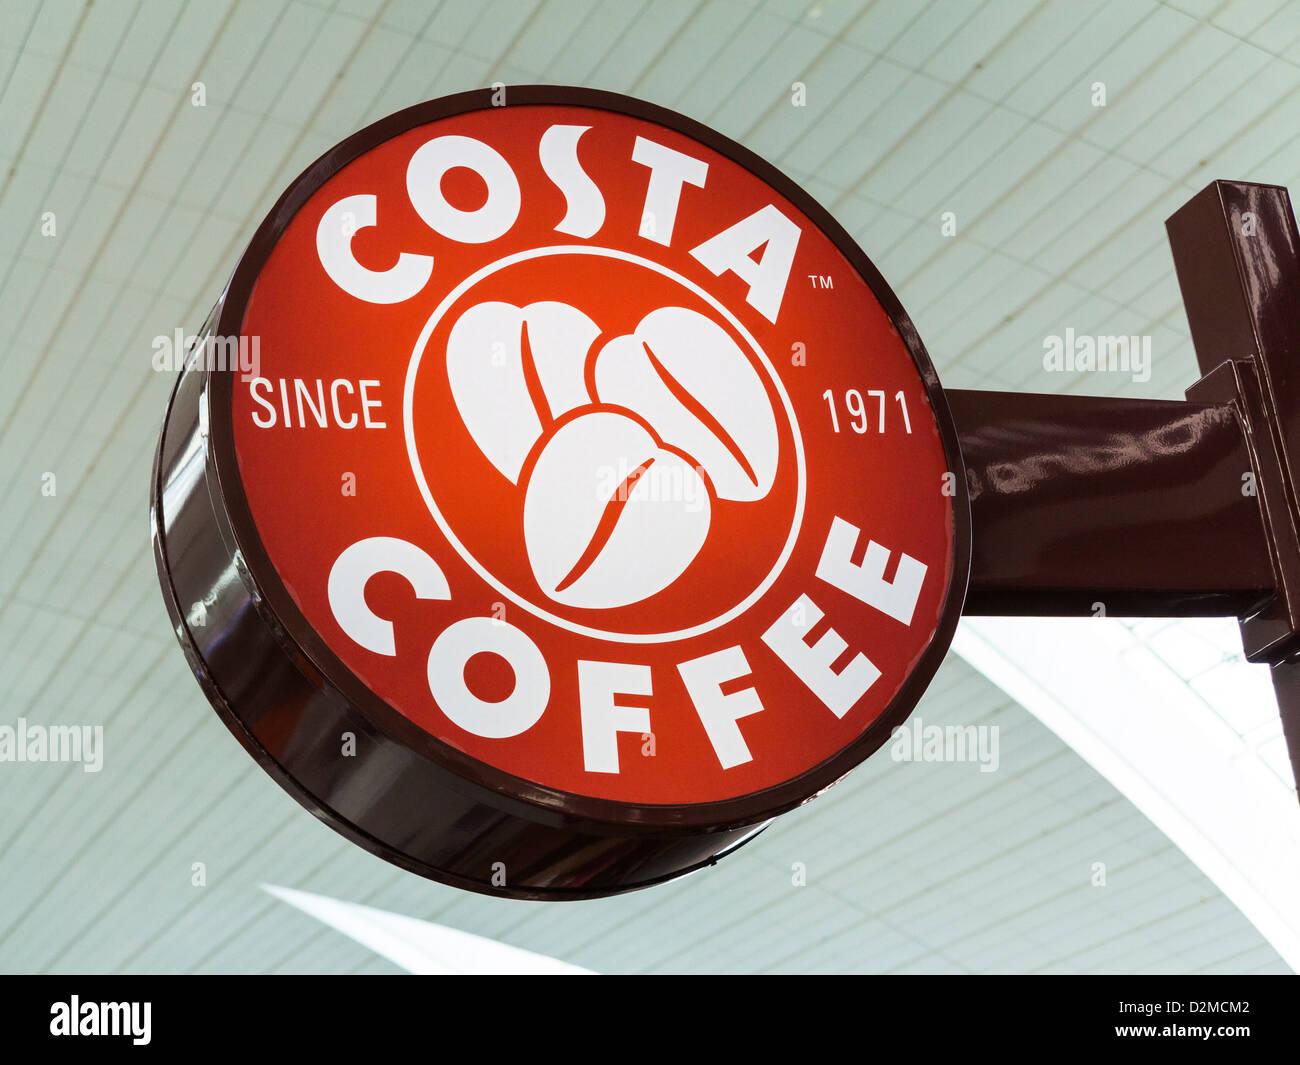 Logo Costa Coffee sign Photo Stock